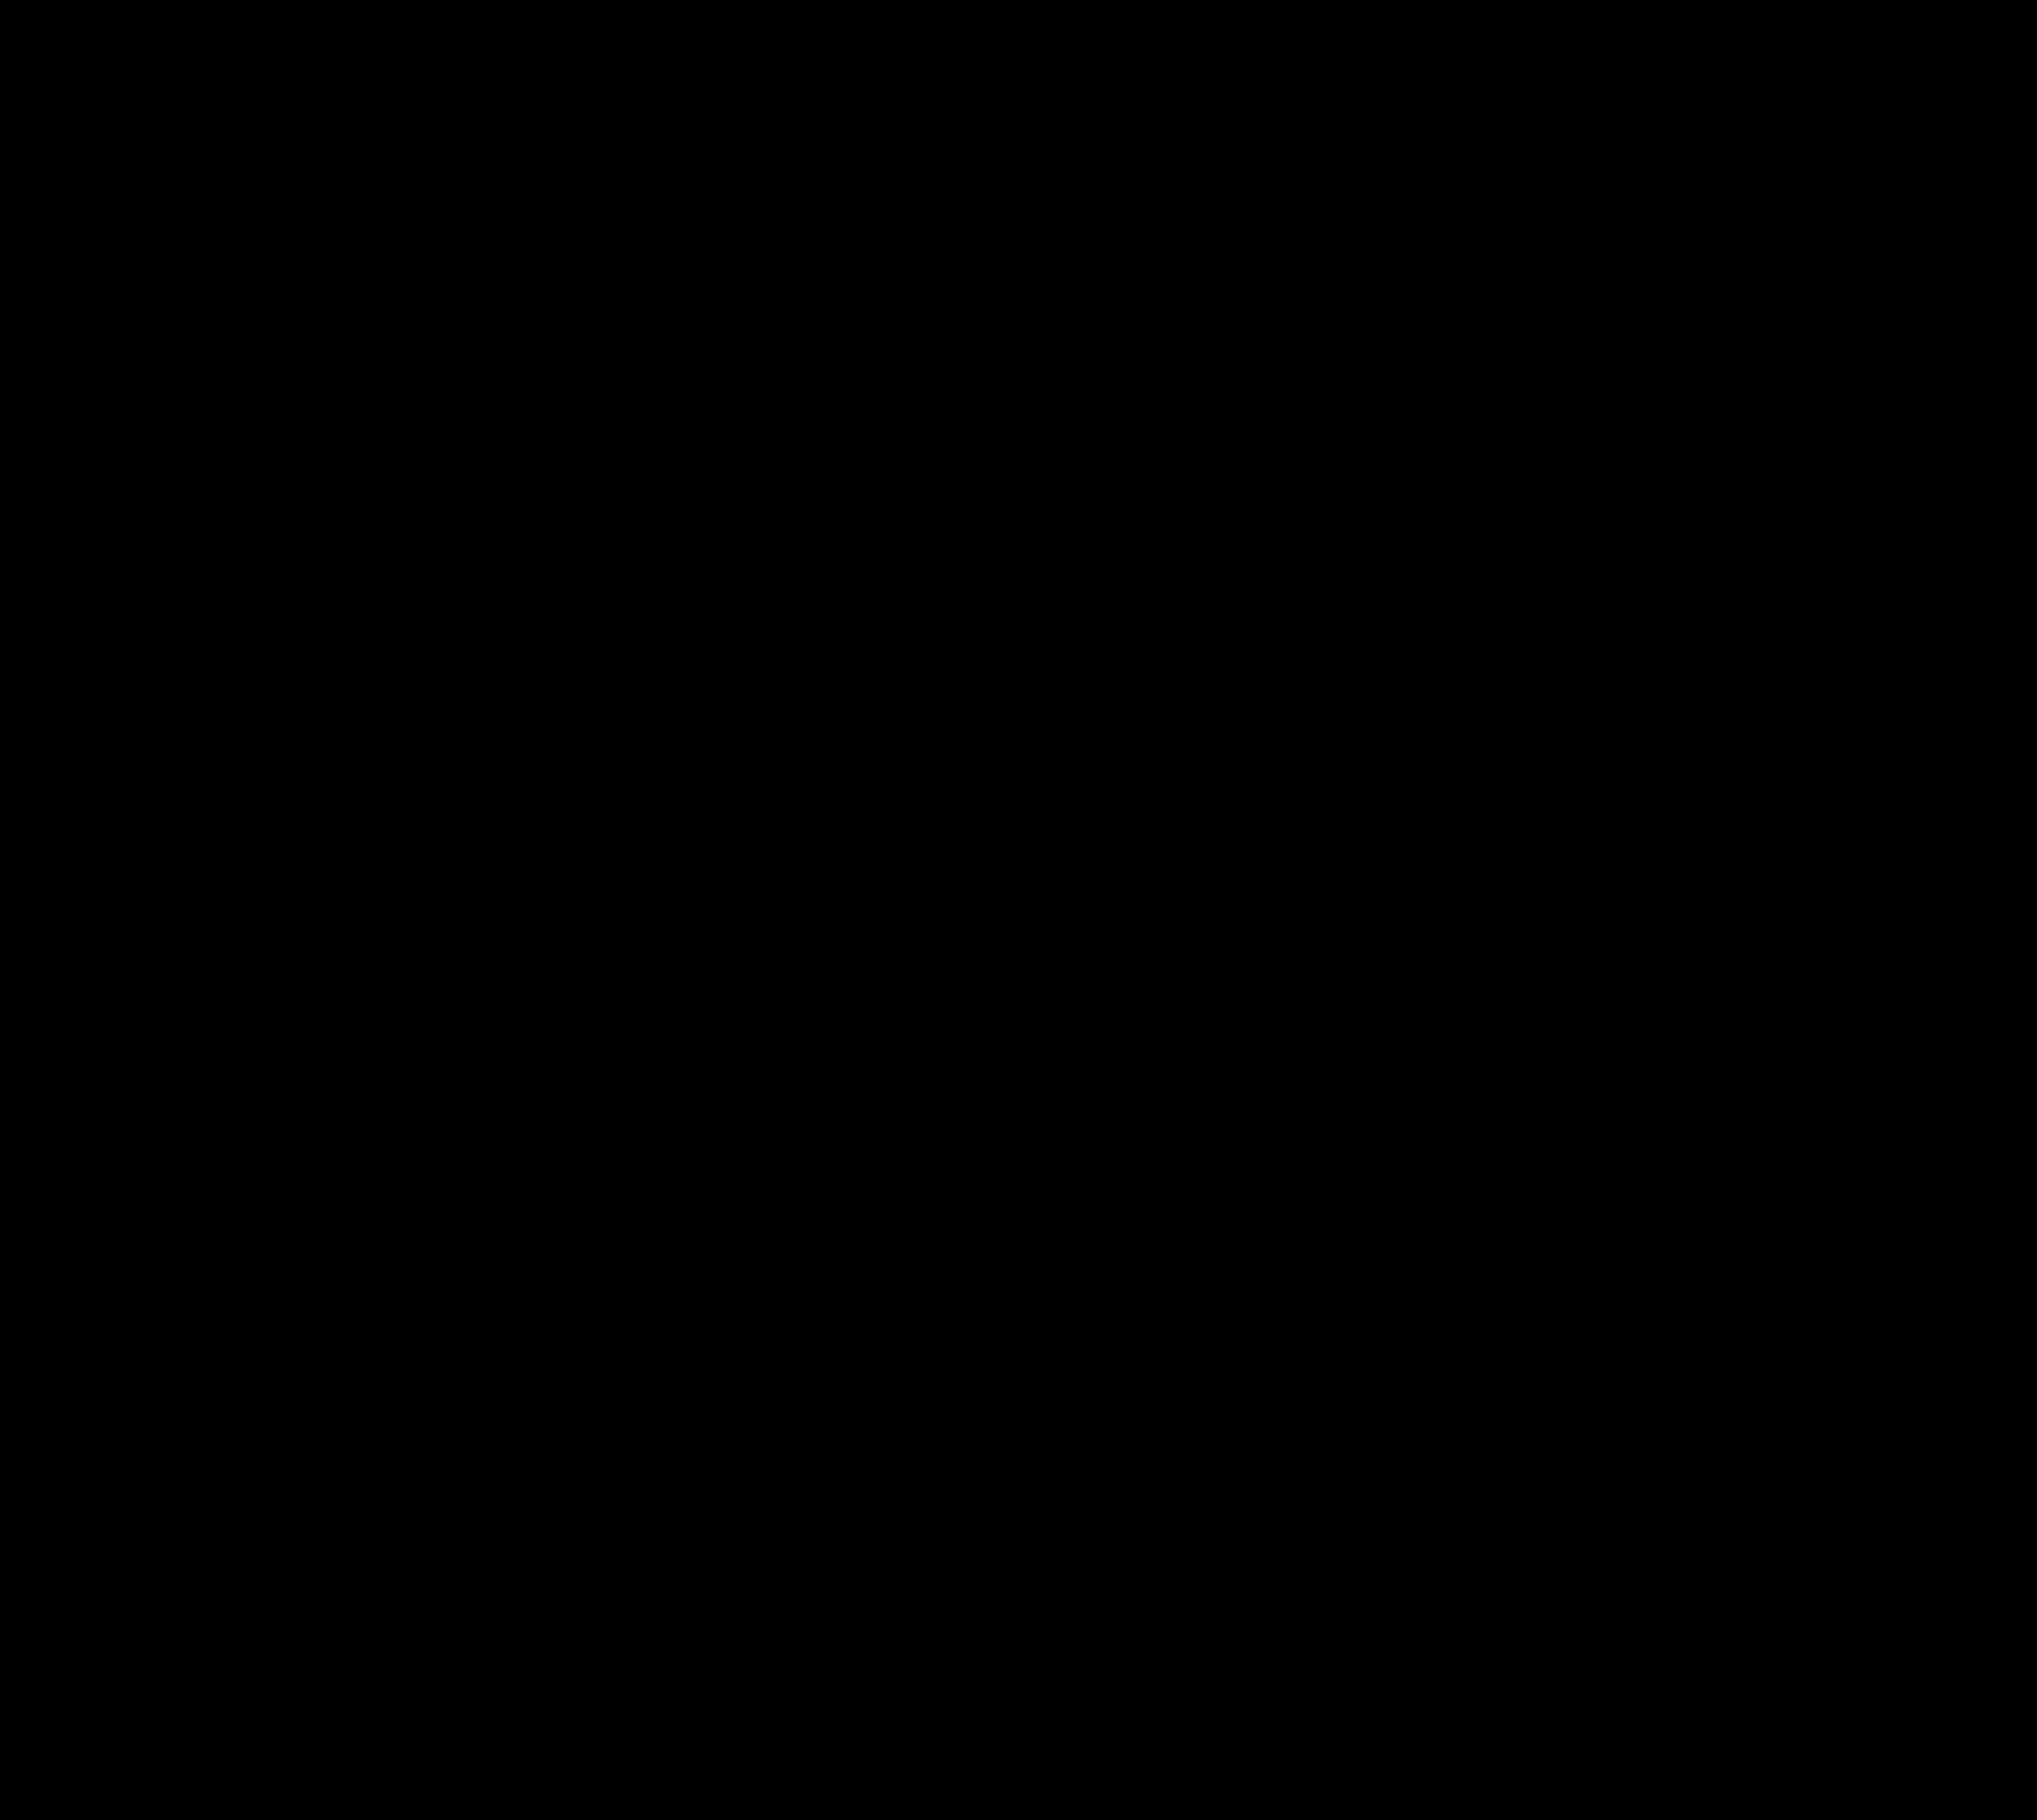 Logo arbre vectorisé